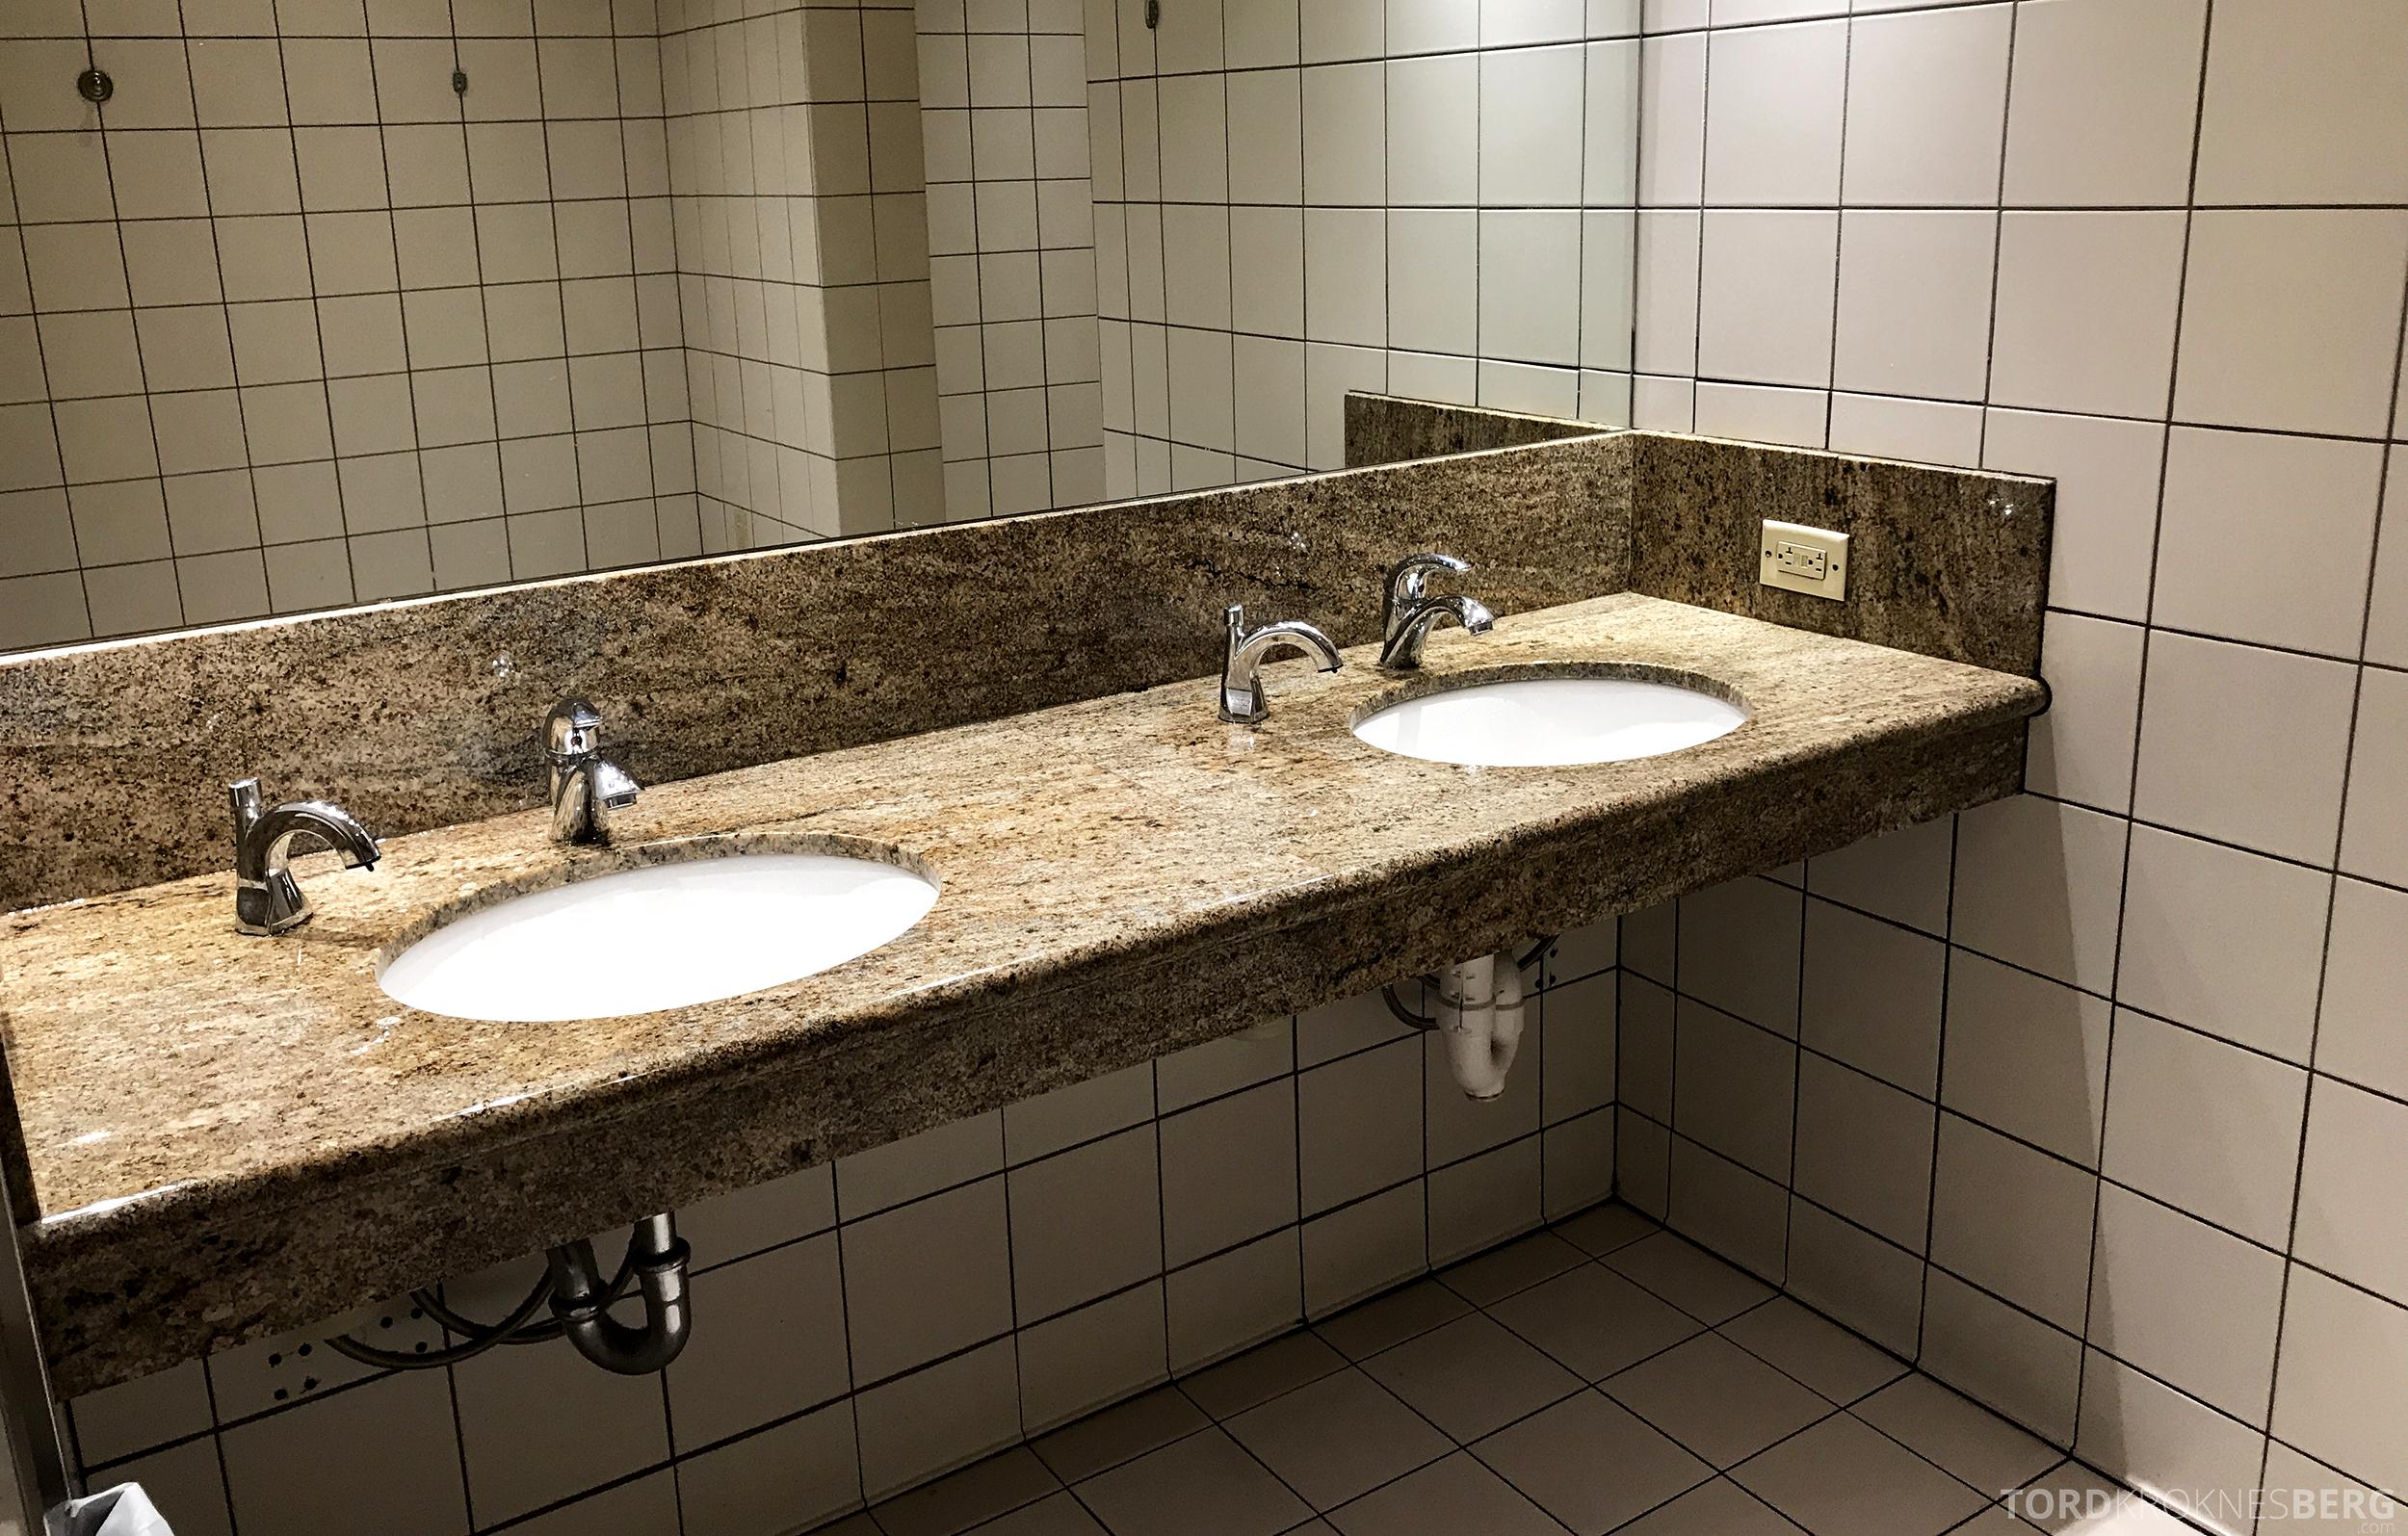 United Club Lounge San Francisco toalett